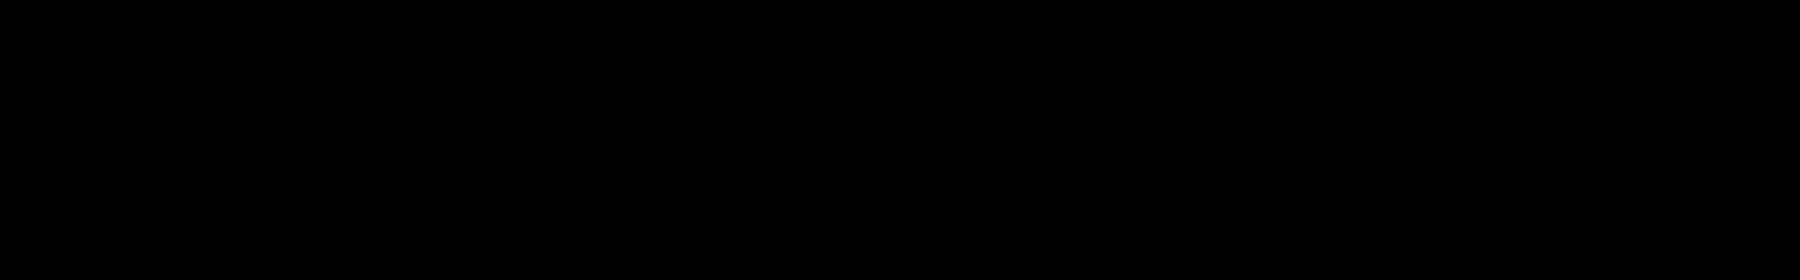 Kamikaze Trap audio waveform